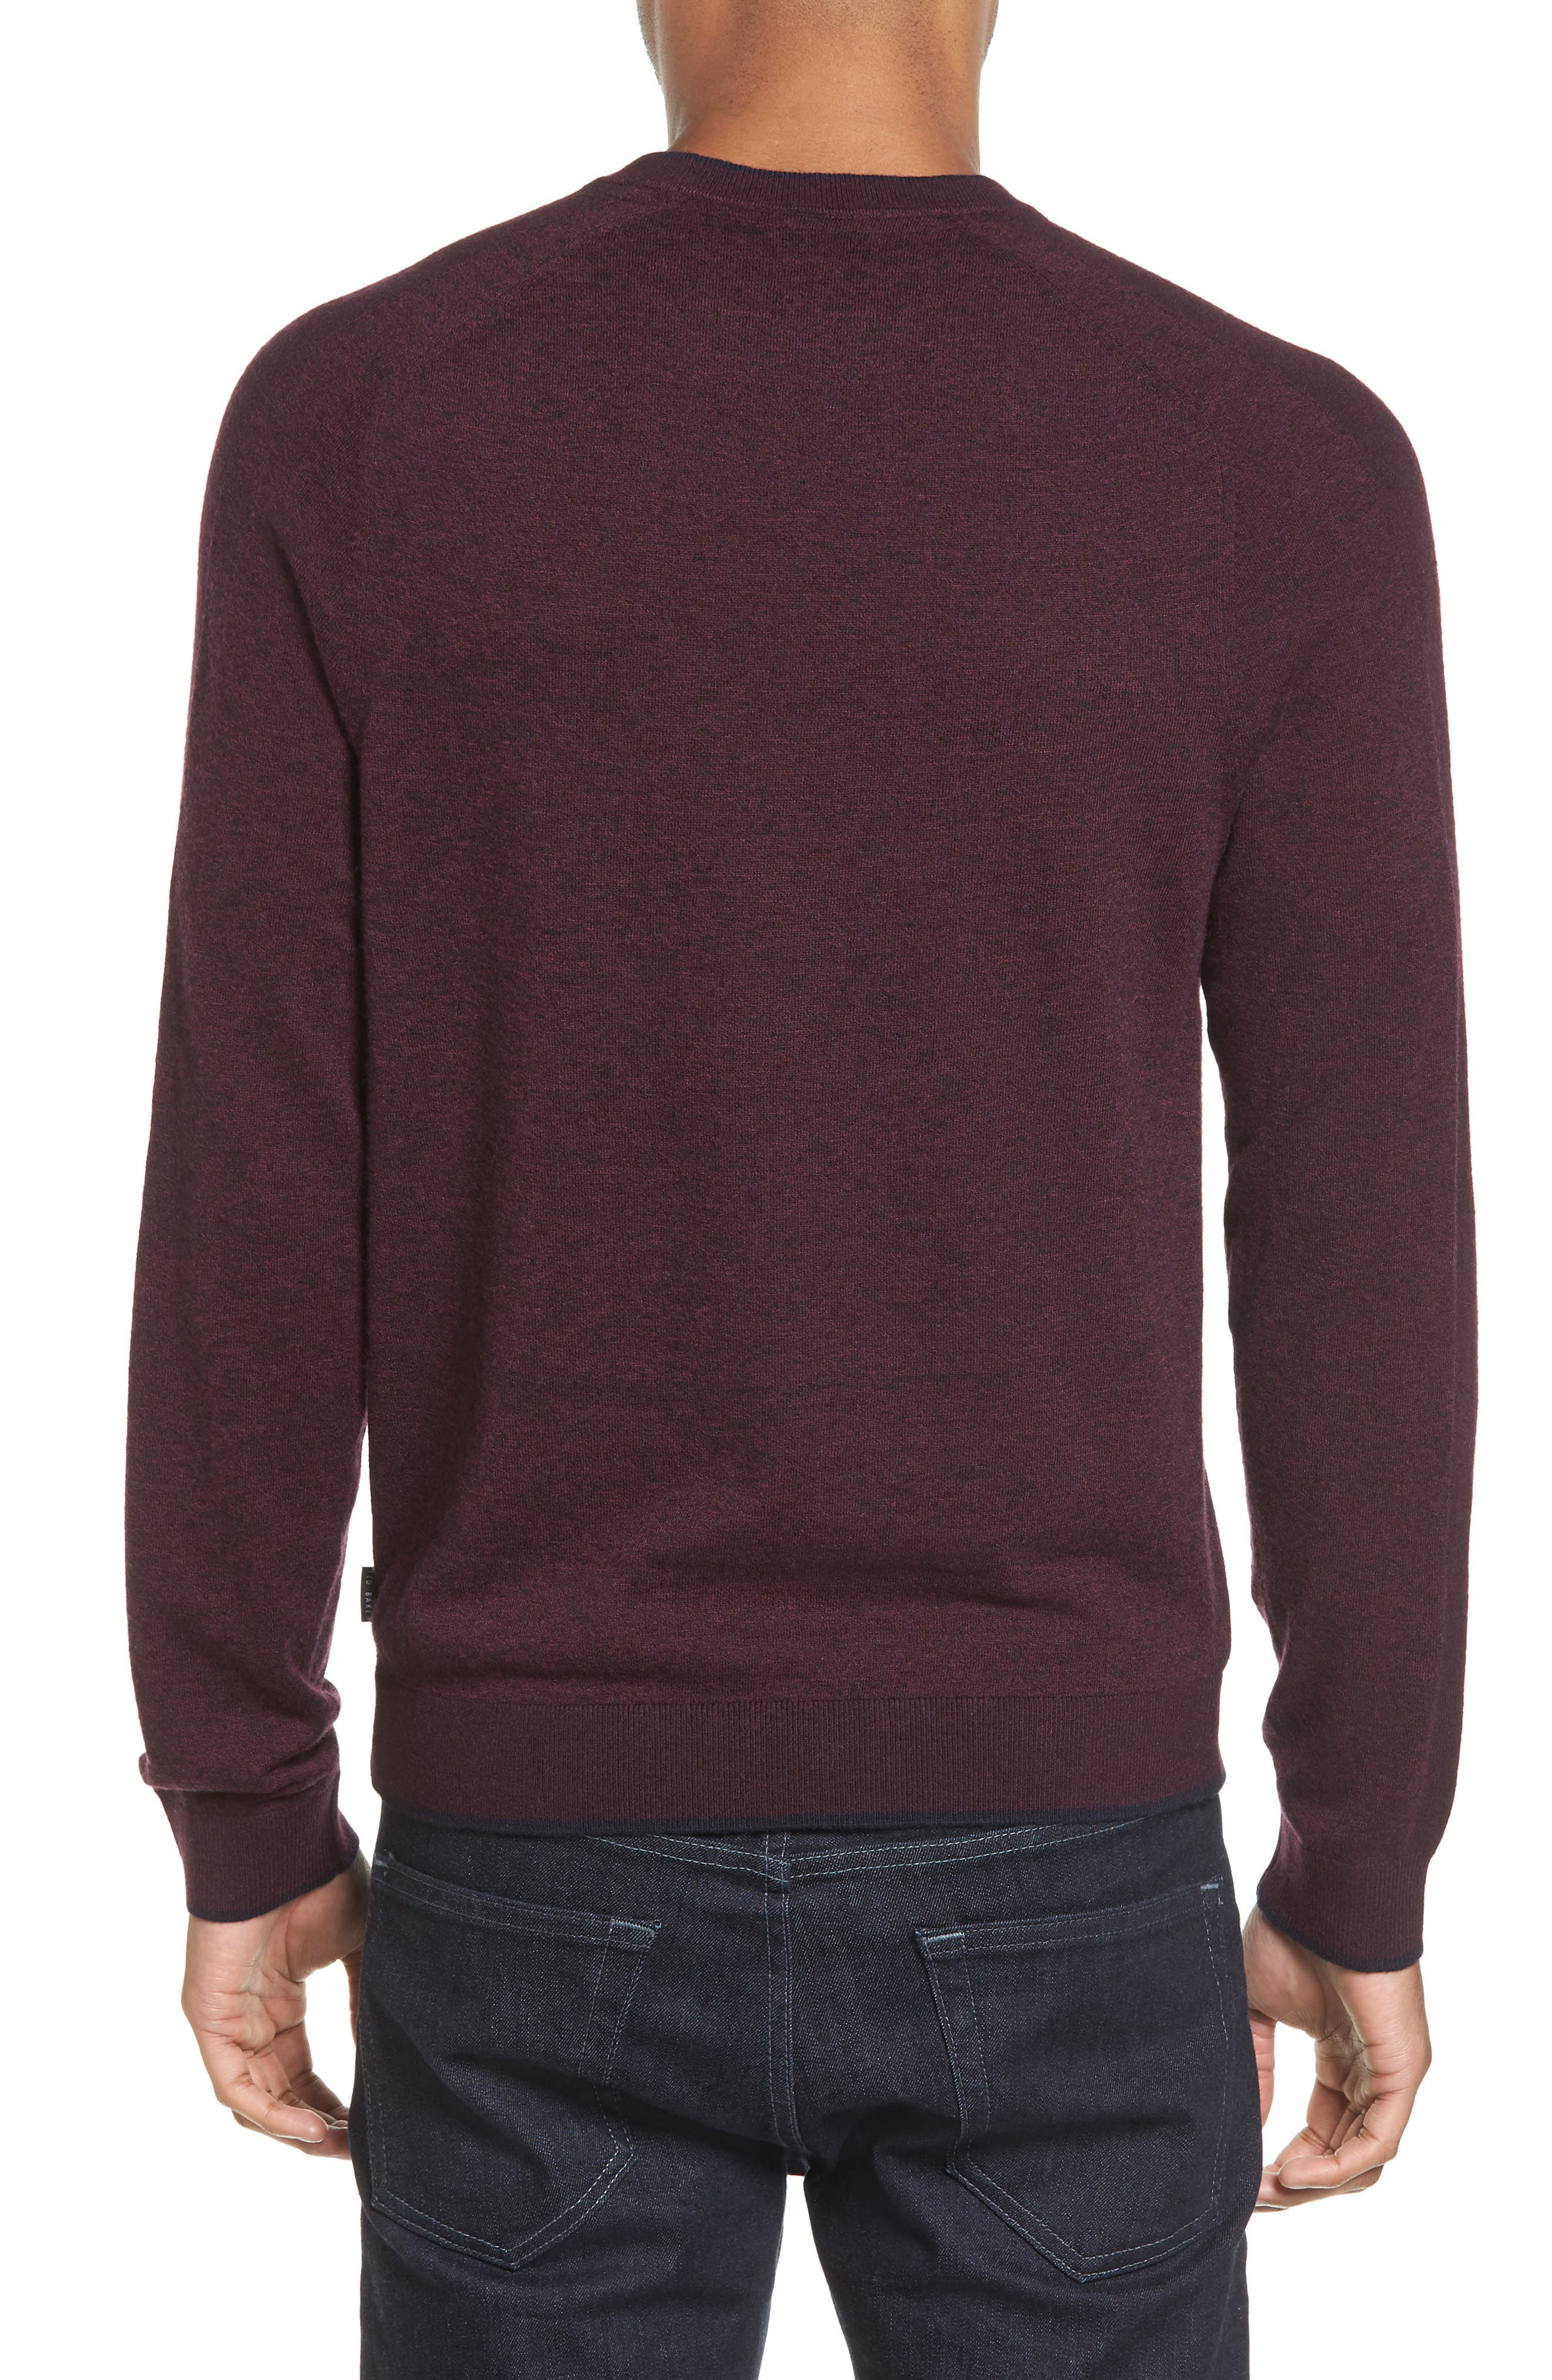 Norpol Crewneck Sweater,                             Alternate thumbnail 8, color,